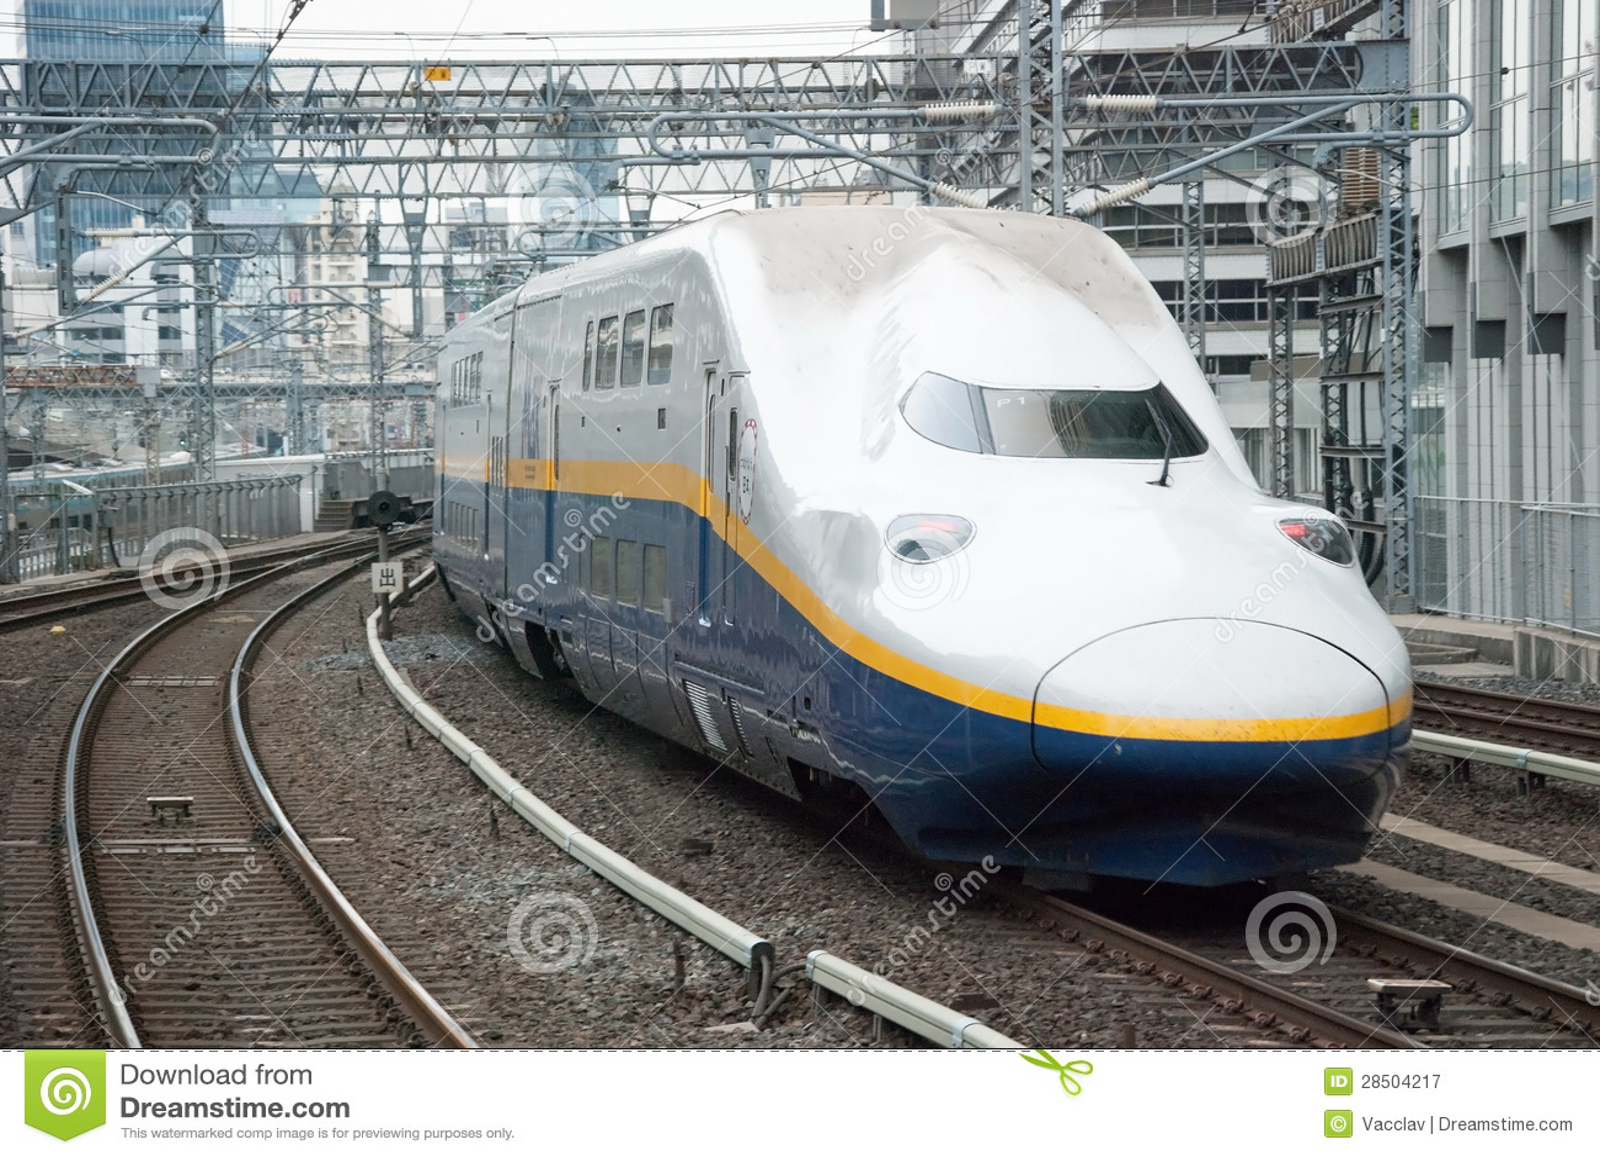 Bullet train stock image. Image of fast, japan, rail 22293385.